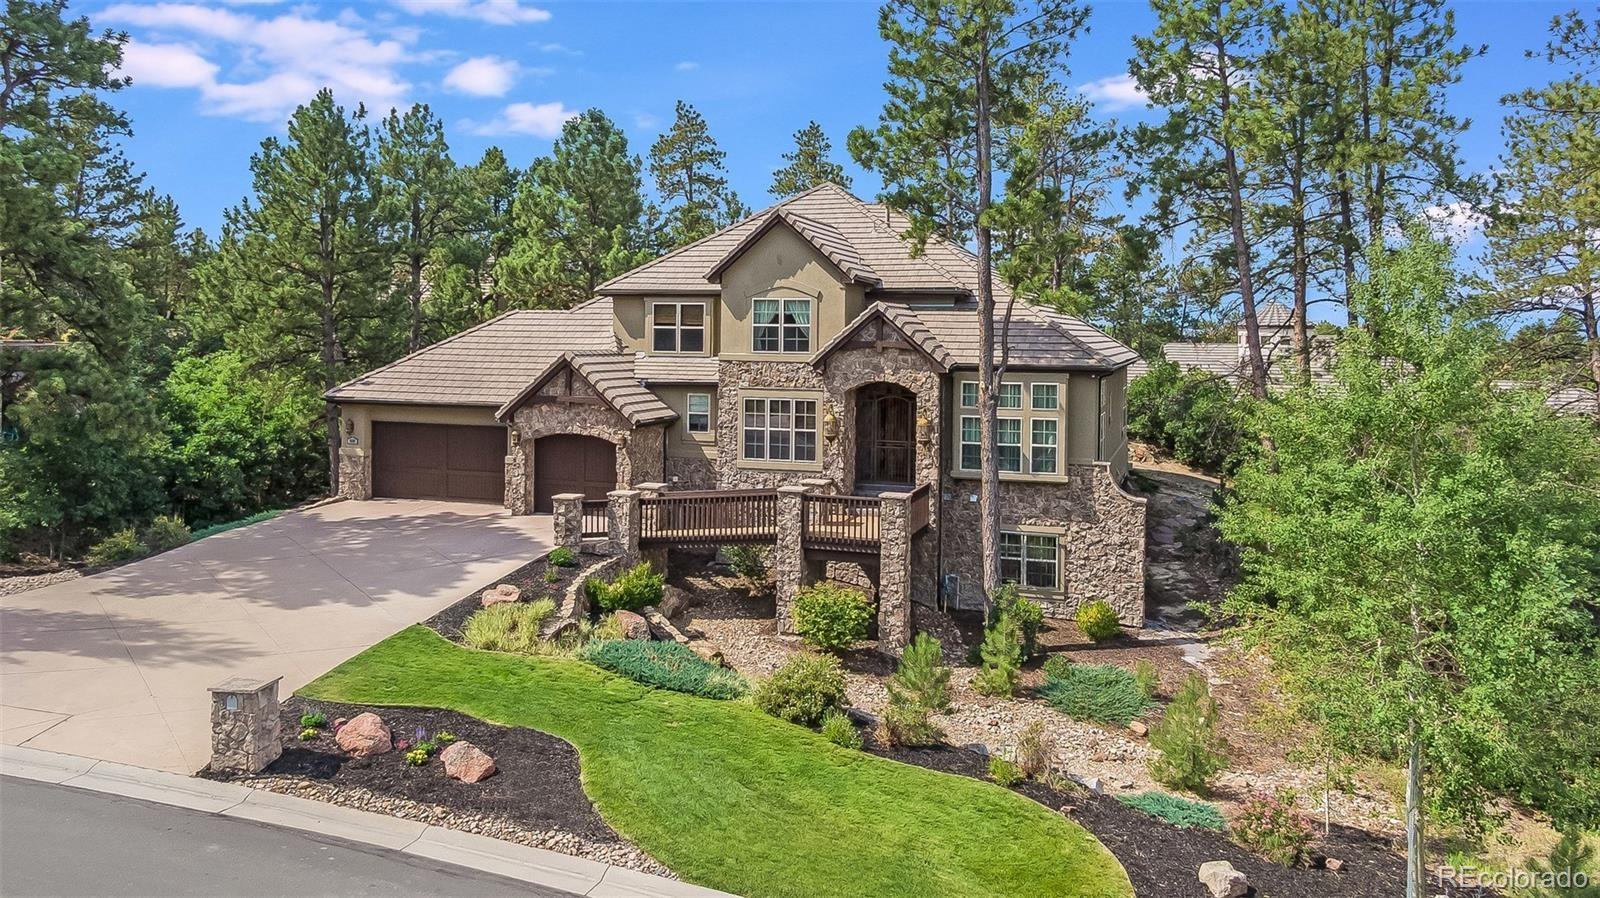 MLS# 6470698 - 1 - 5225 Knobcone Drive, Castle Rock, CO 80108